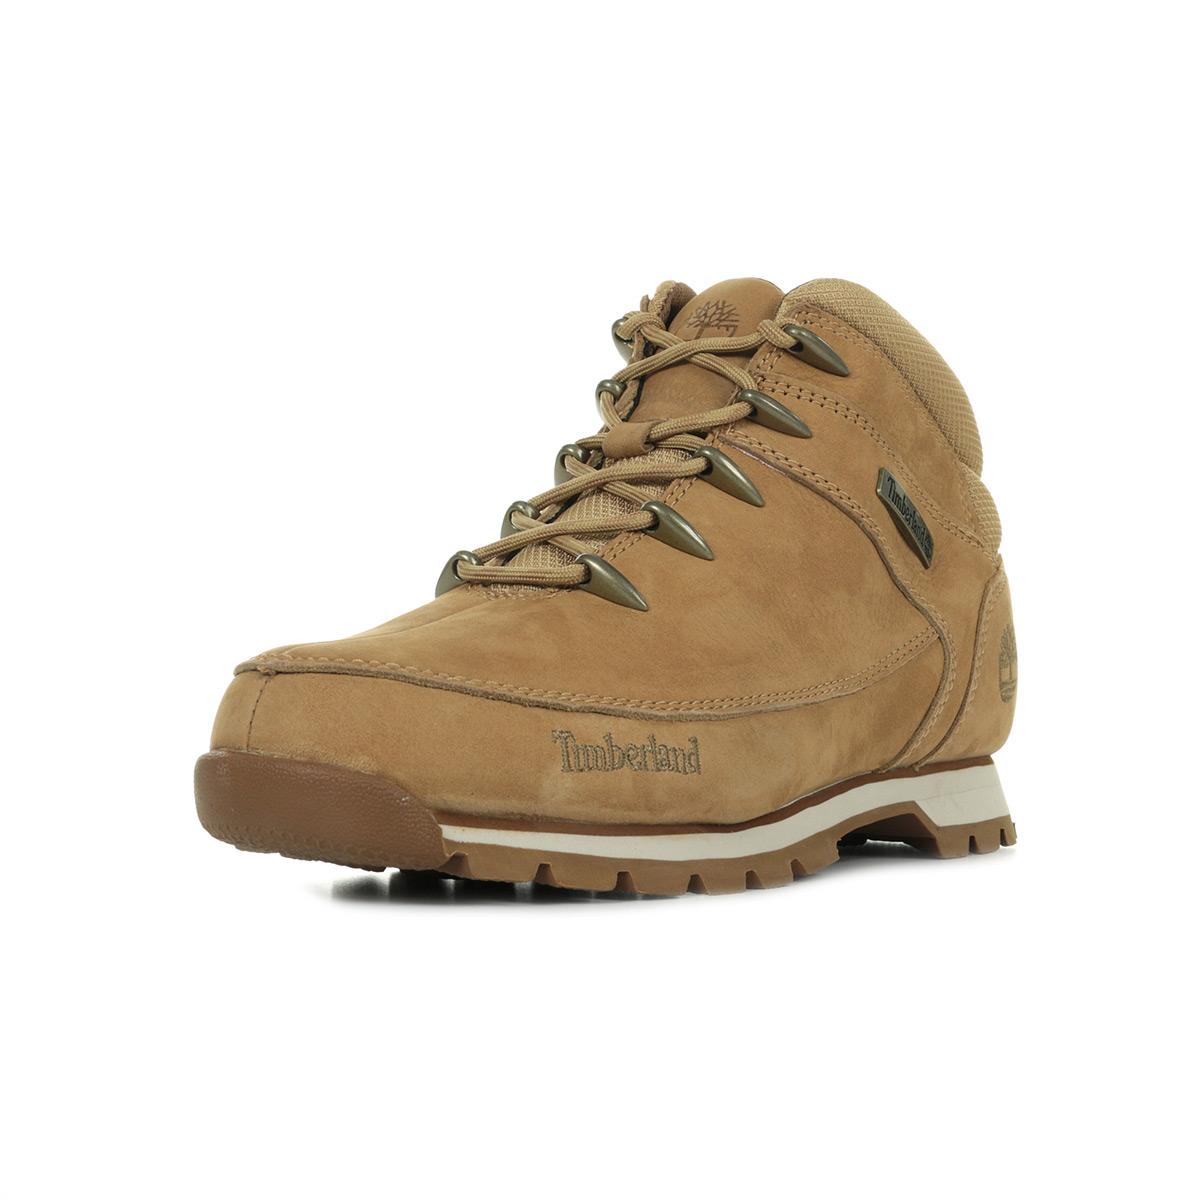 Mid Euro Hiker Beige Medium Ca1wheBoots Timberland Nubuck Sprint Homme BtsdrxhQCo